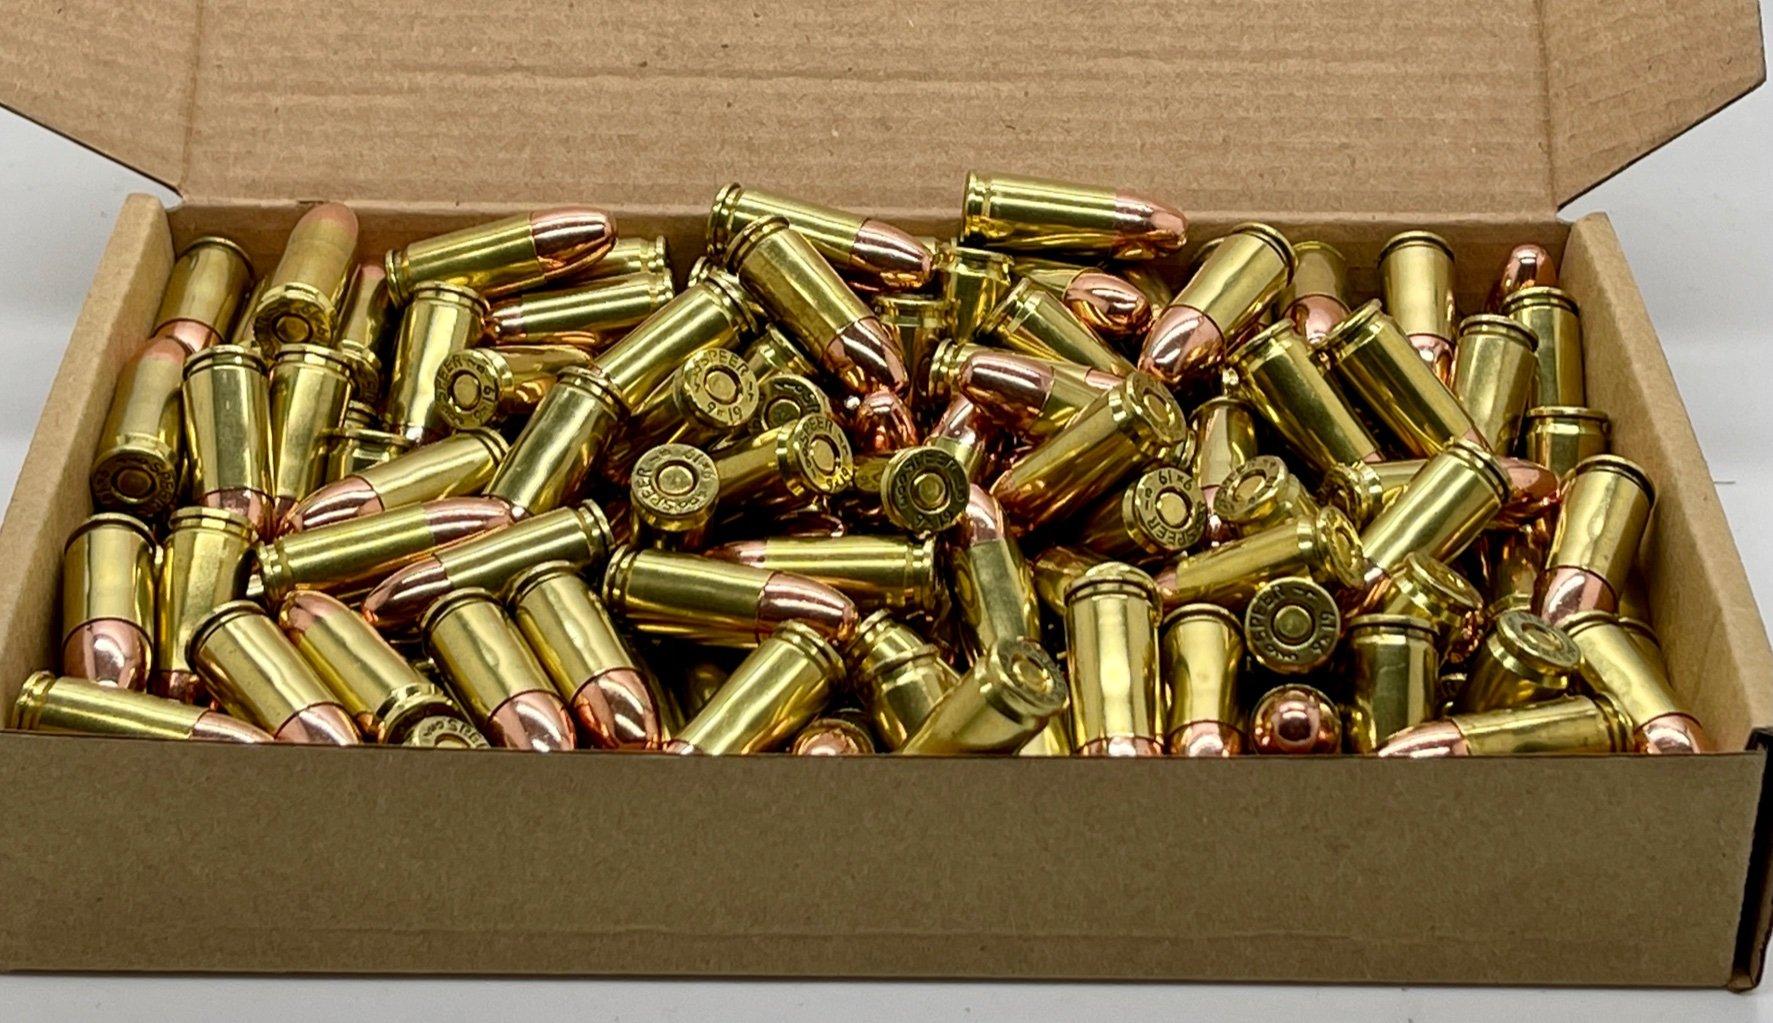 ZMA Ammo Premium 9x19mm 200 stk. 124gr. CamPro RN copper-plated